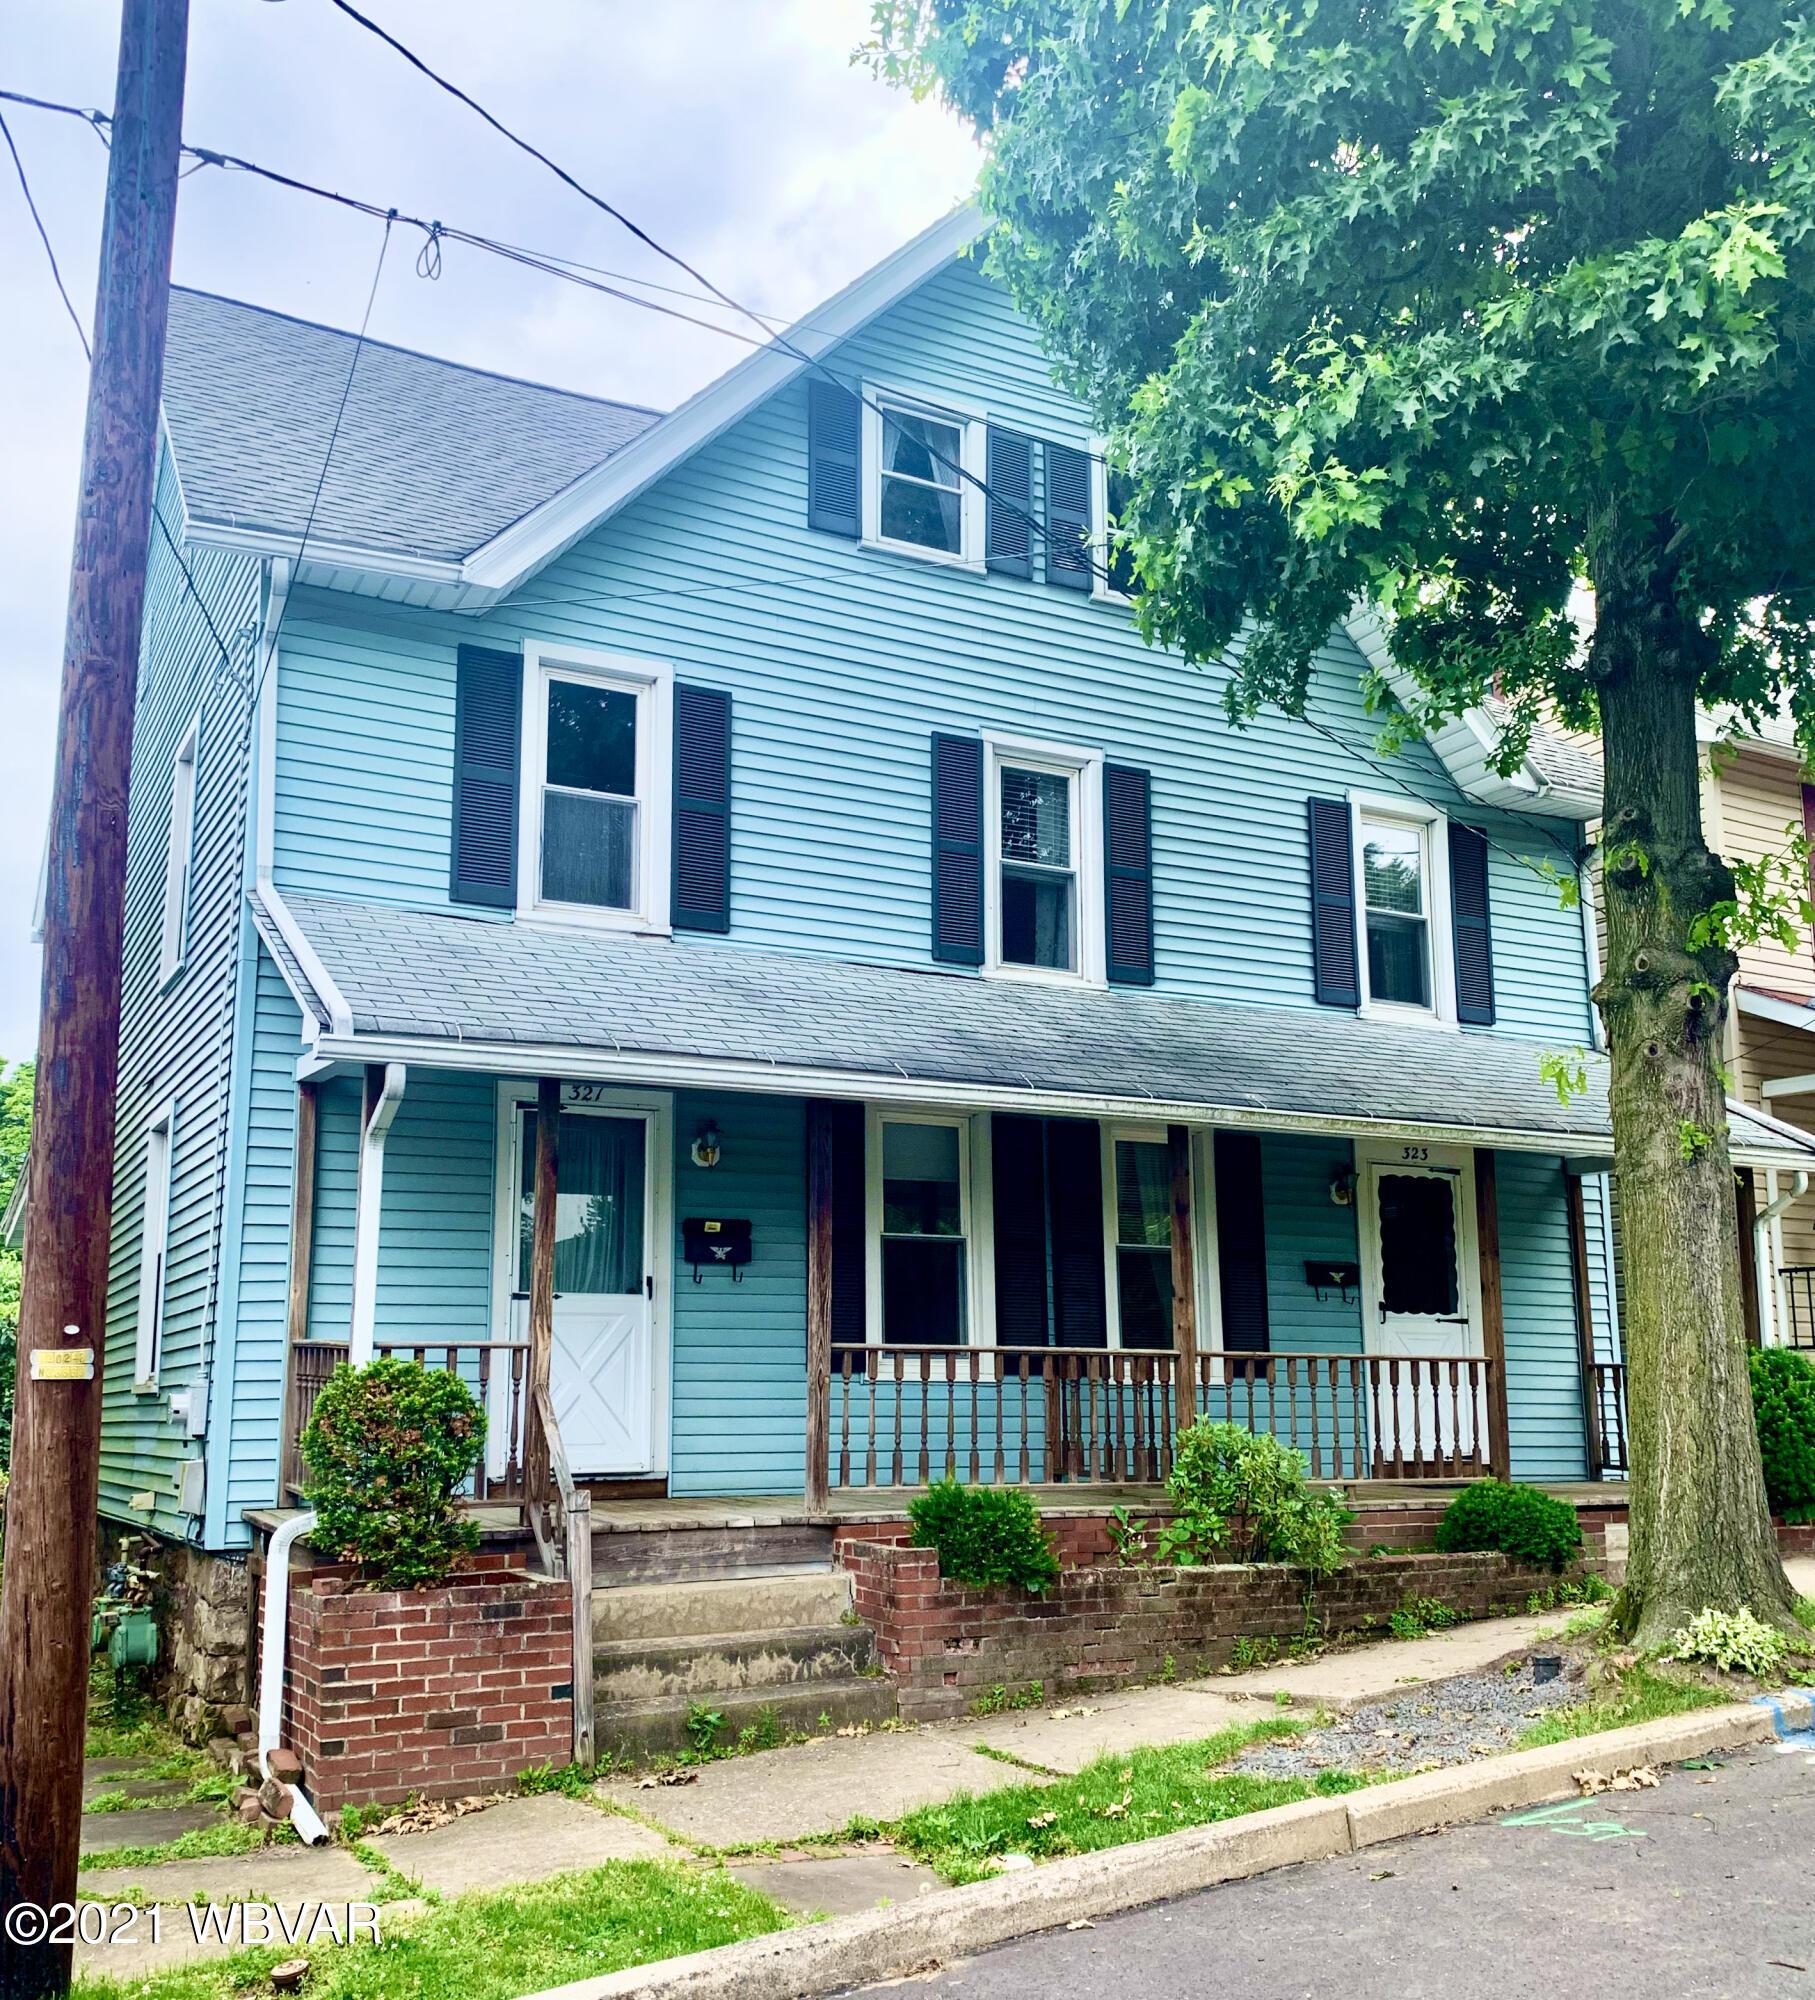 321 MEADOW STREET, S. Williamsport, PA 17702, 2 Bedrooms Bedrooms, ,1 BathroomBathrooms,Resid-lease/rental,For sale,MEADOW,WB-92751